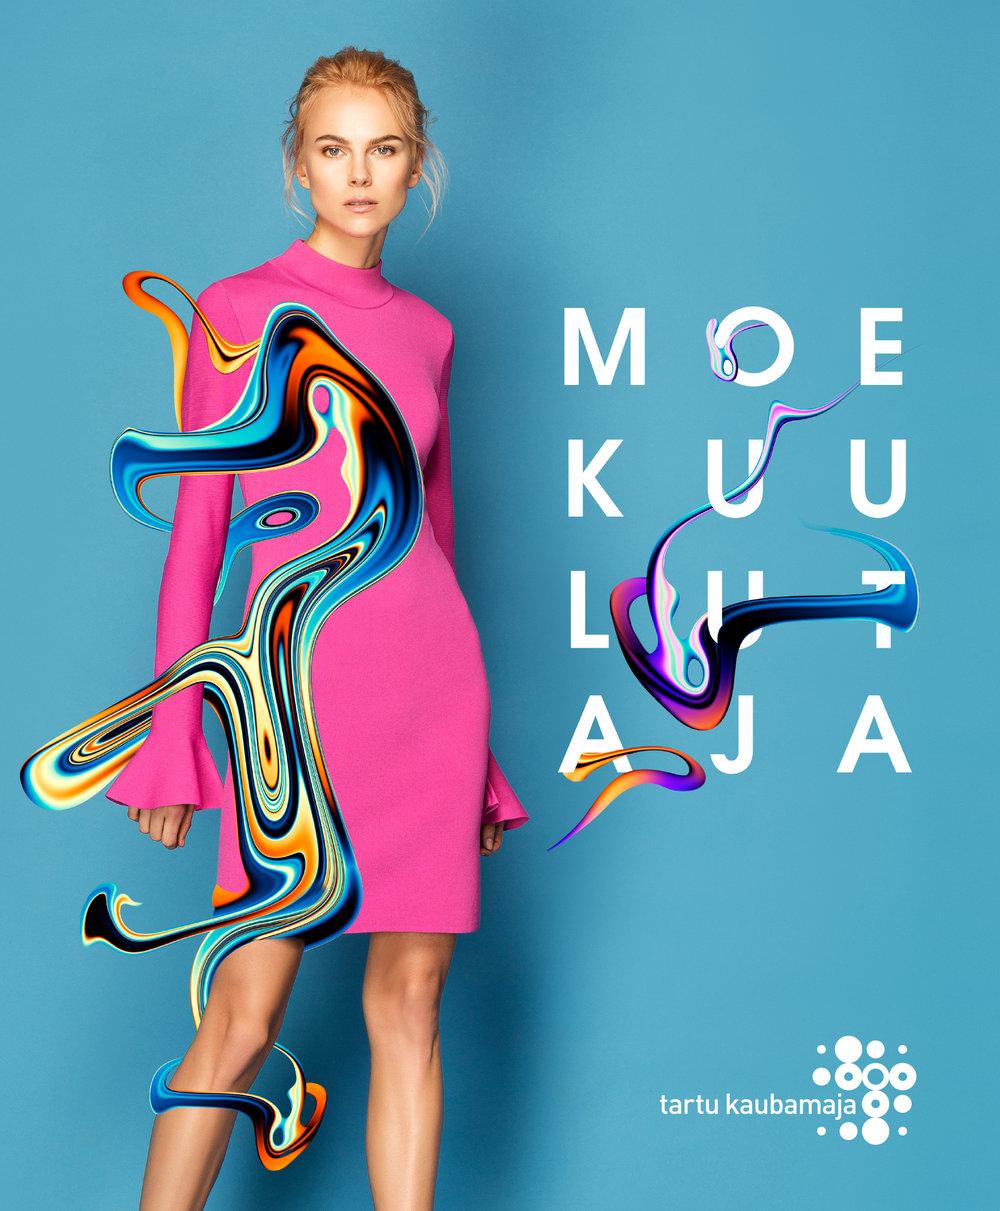 TK_MoKu2018_kevad_visual.jpg